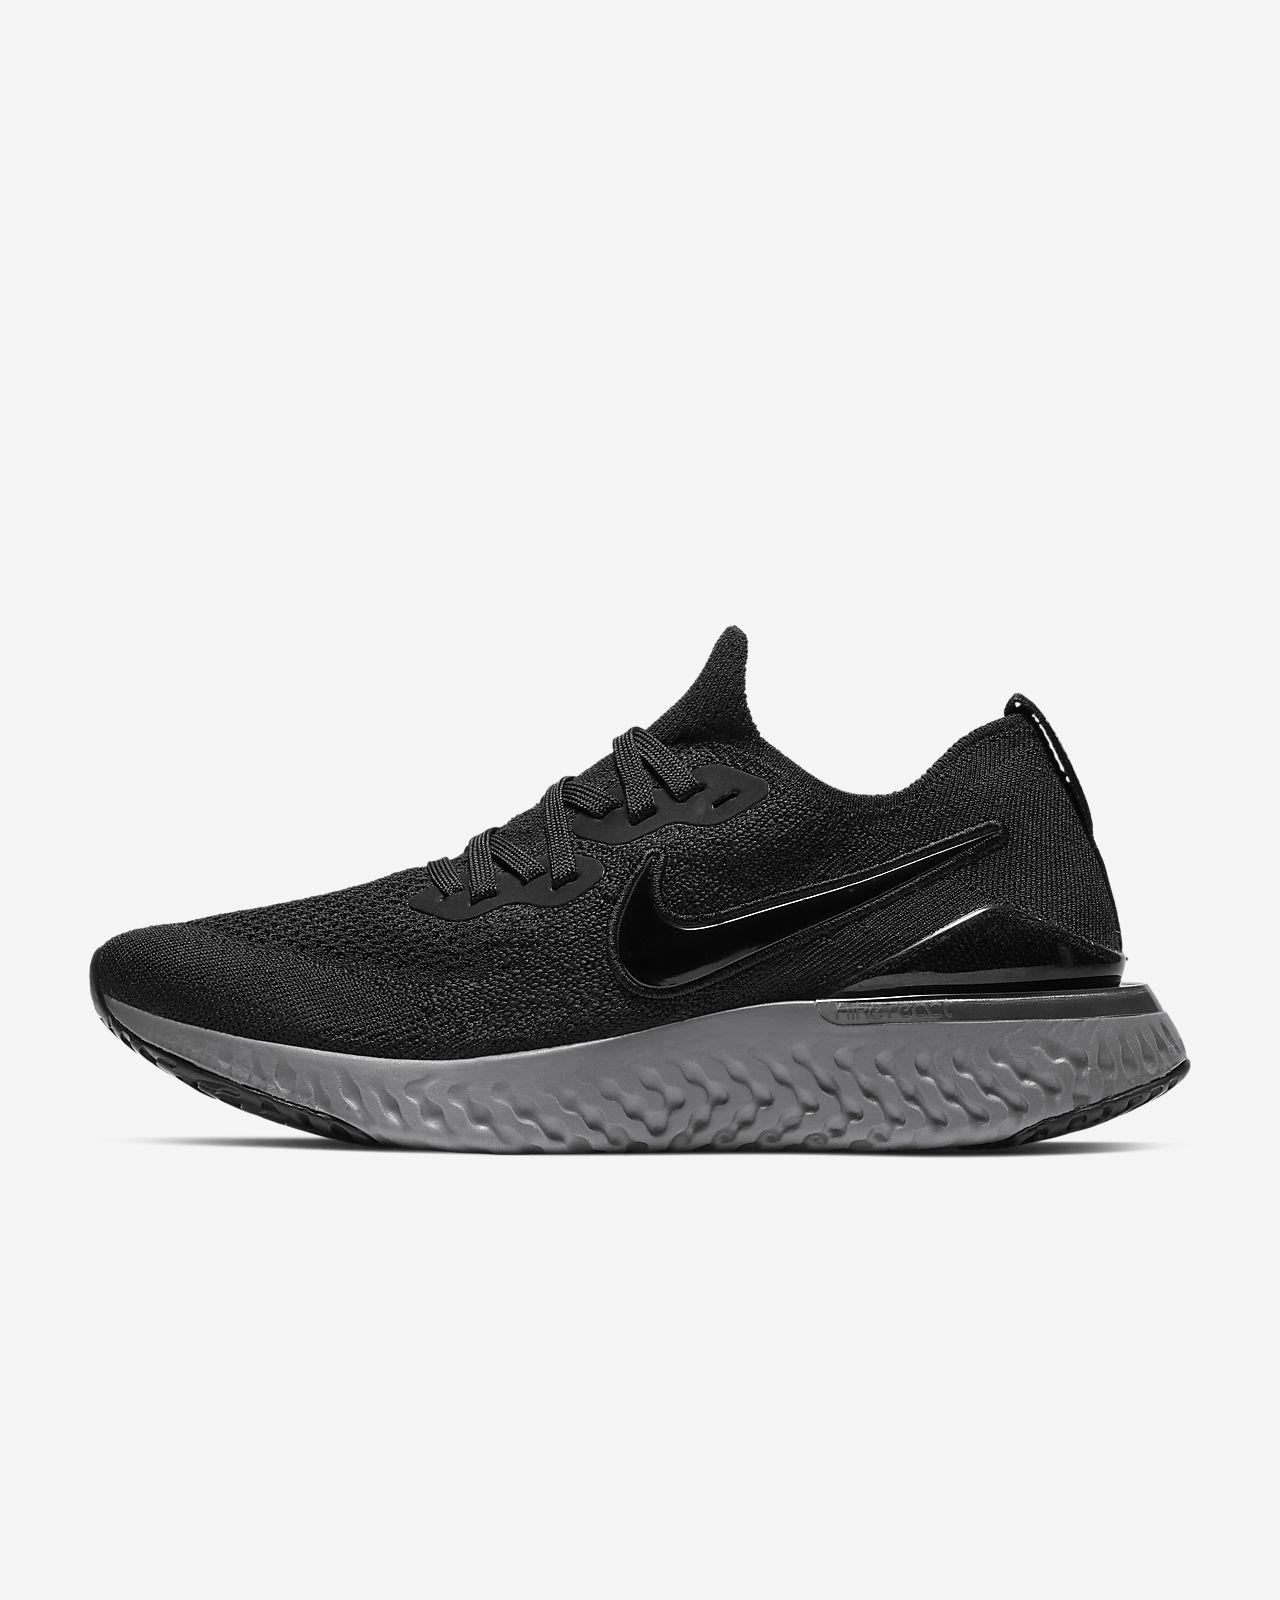 separation shoes c6ddb 249d7 ... Chaussure de running Nike Epic React Flyknit 2 pour Femme